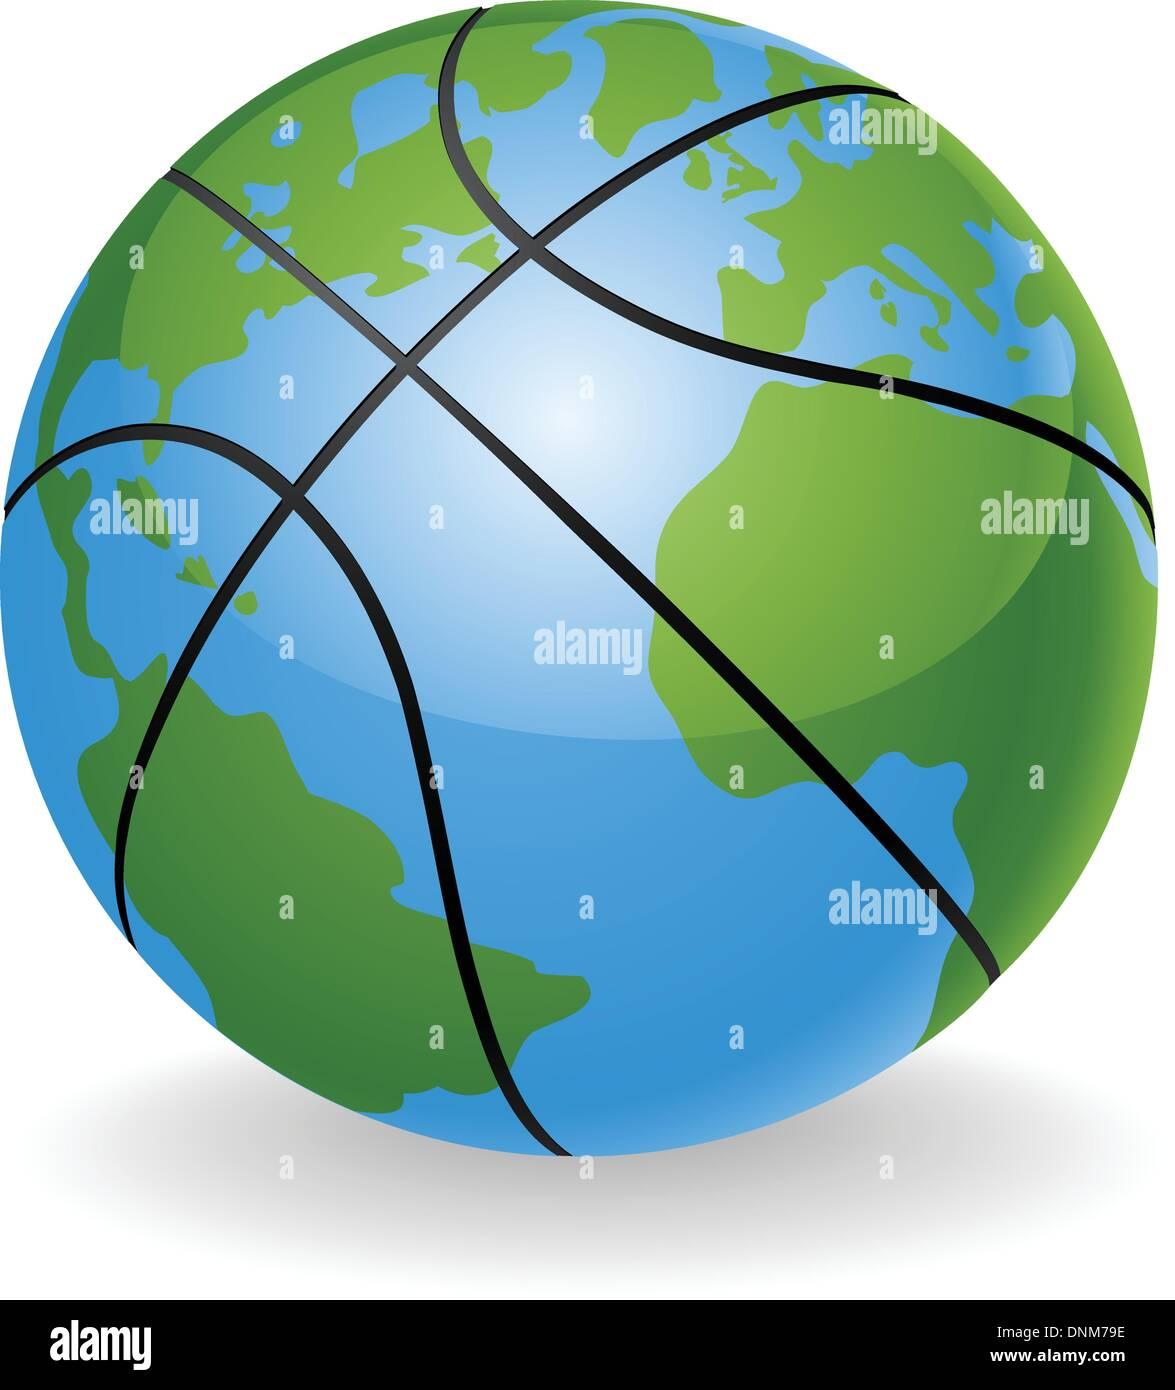 world globe basketball ball ball concept illustration stock vector